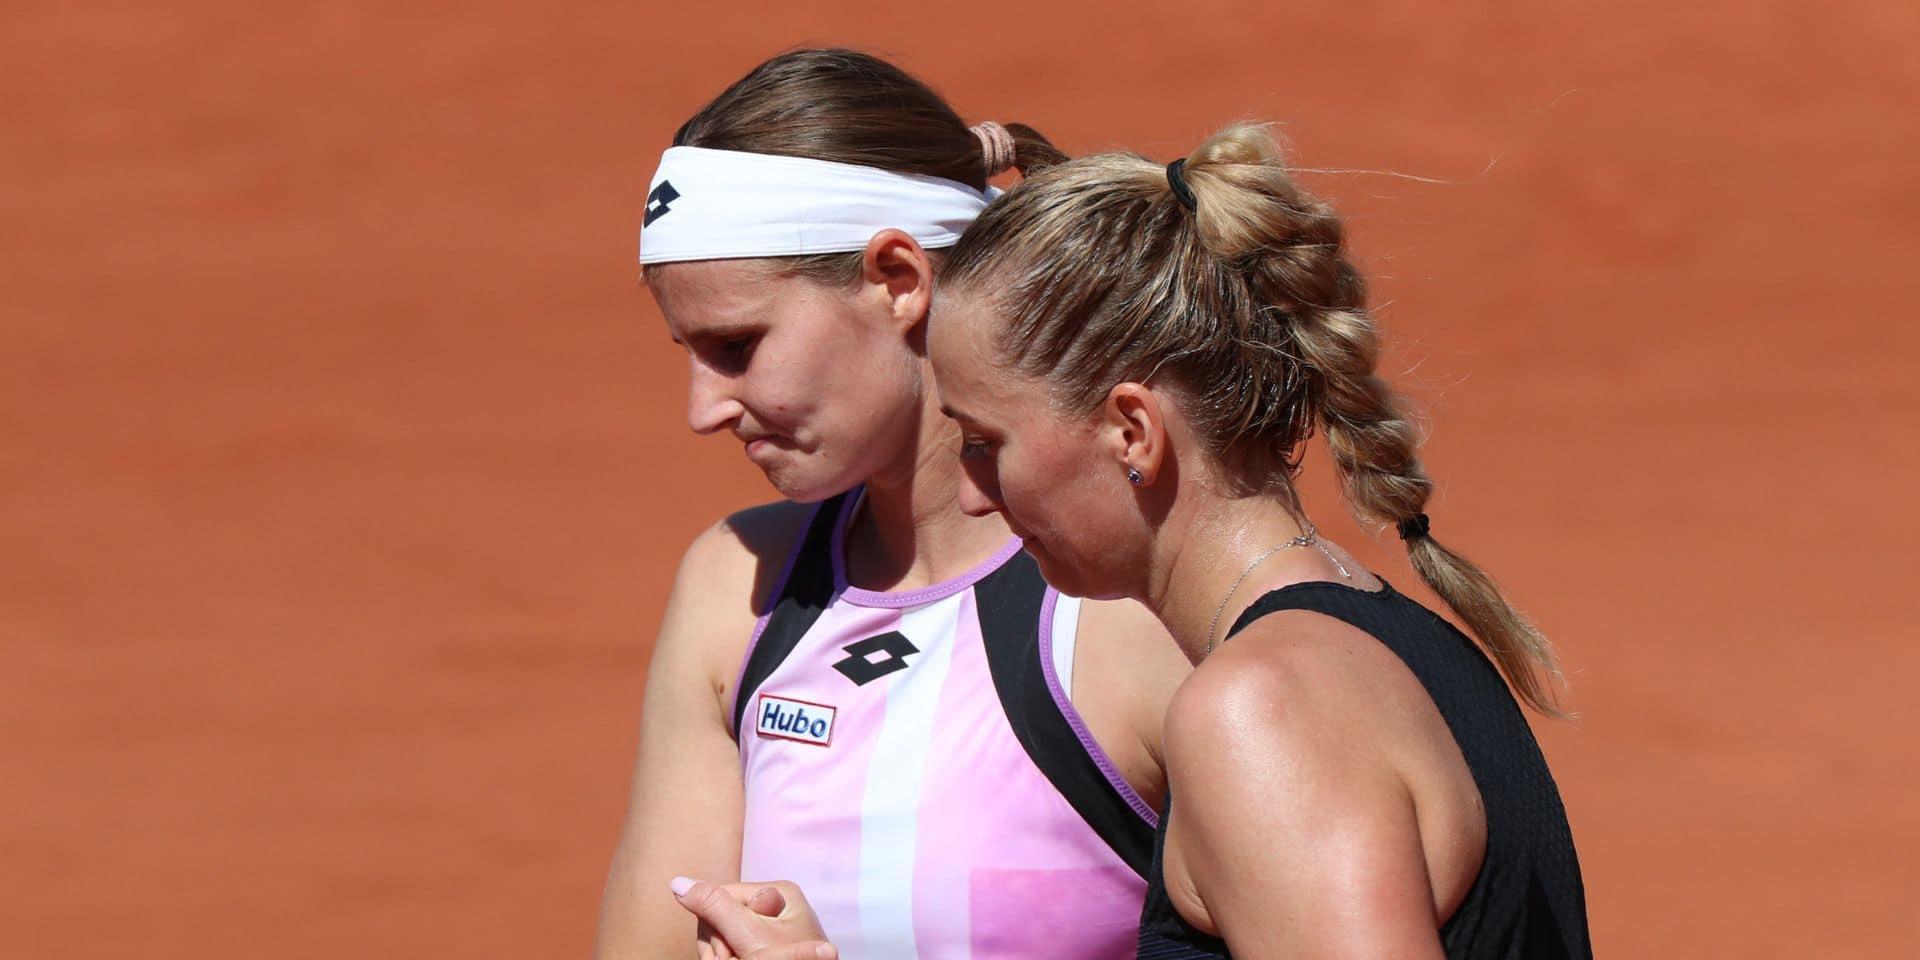 Roland-Garros: Malgré une balle de match, Greet Minnen s'incline contre Petra Kvitova